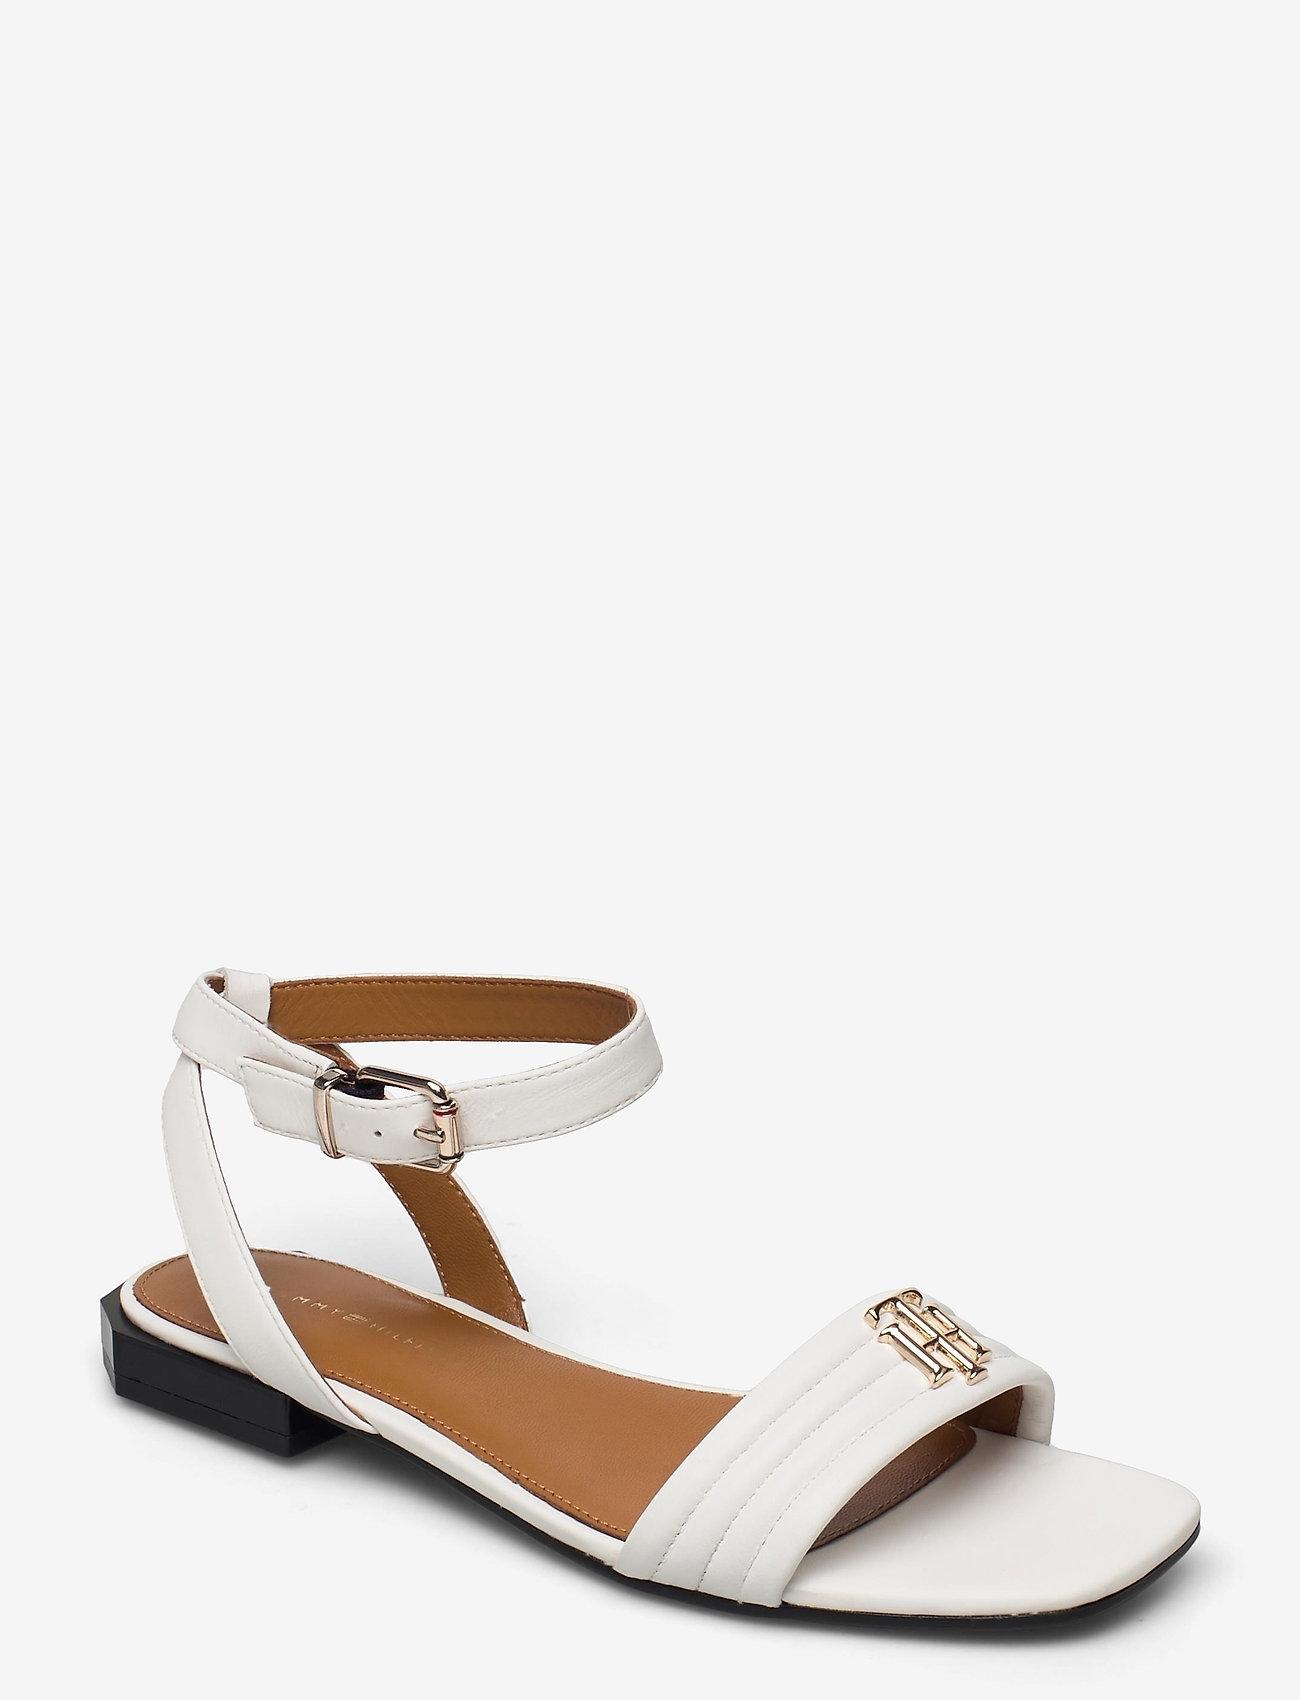 Tommy Hilfiger - TOMMY PADDED FLAT SANDAL - flat sandals - ecru - 0